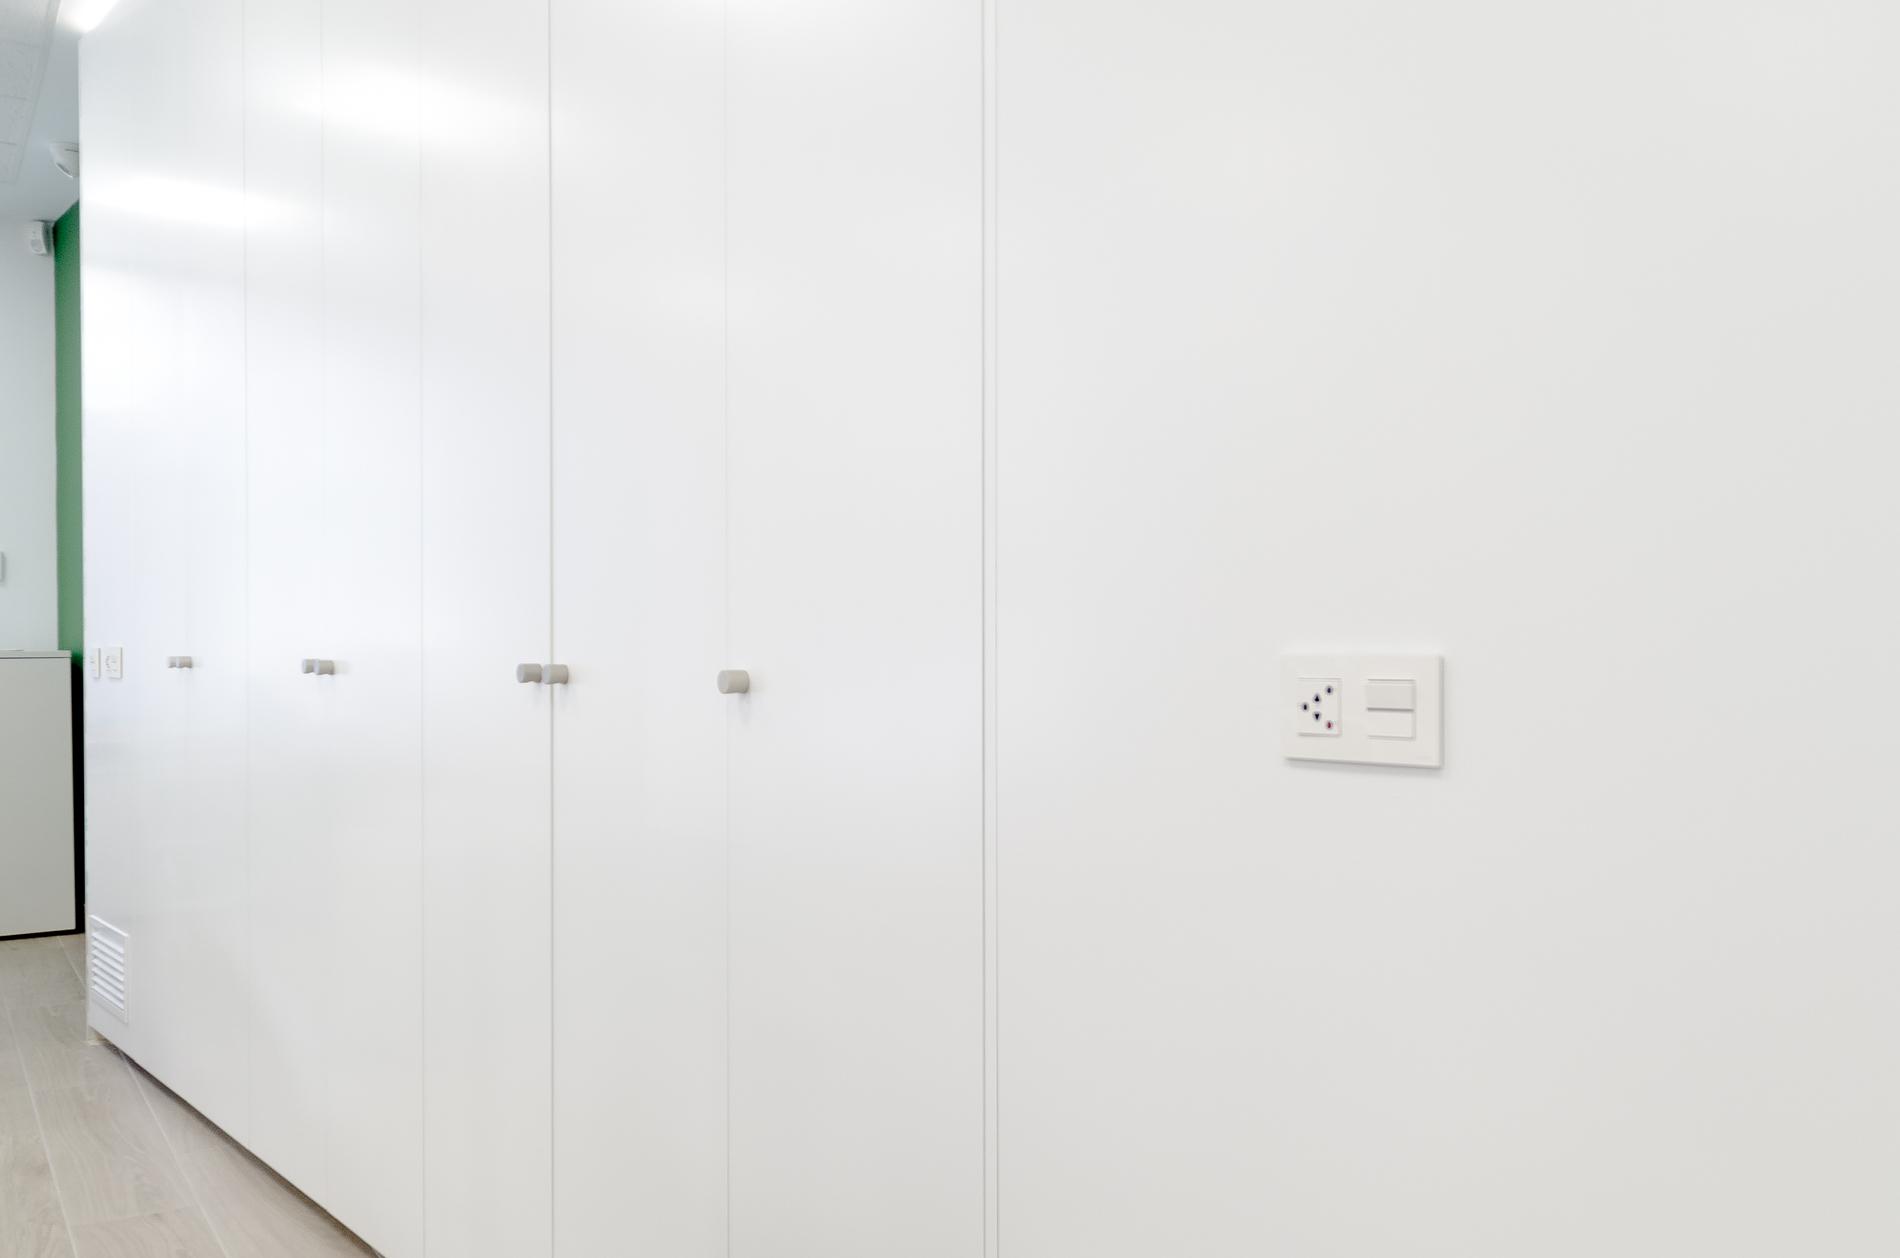 Proyecto caixa popular oficines muebles de oficina en for Caixa enginyers oficines